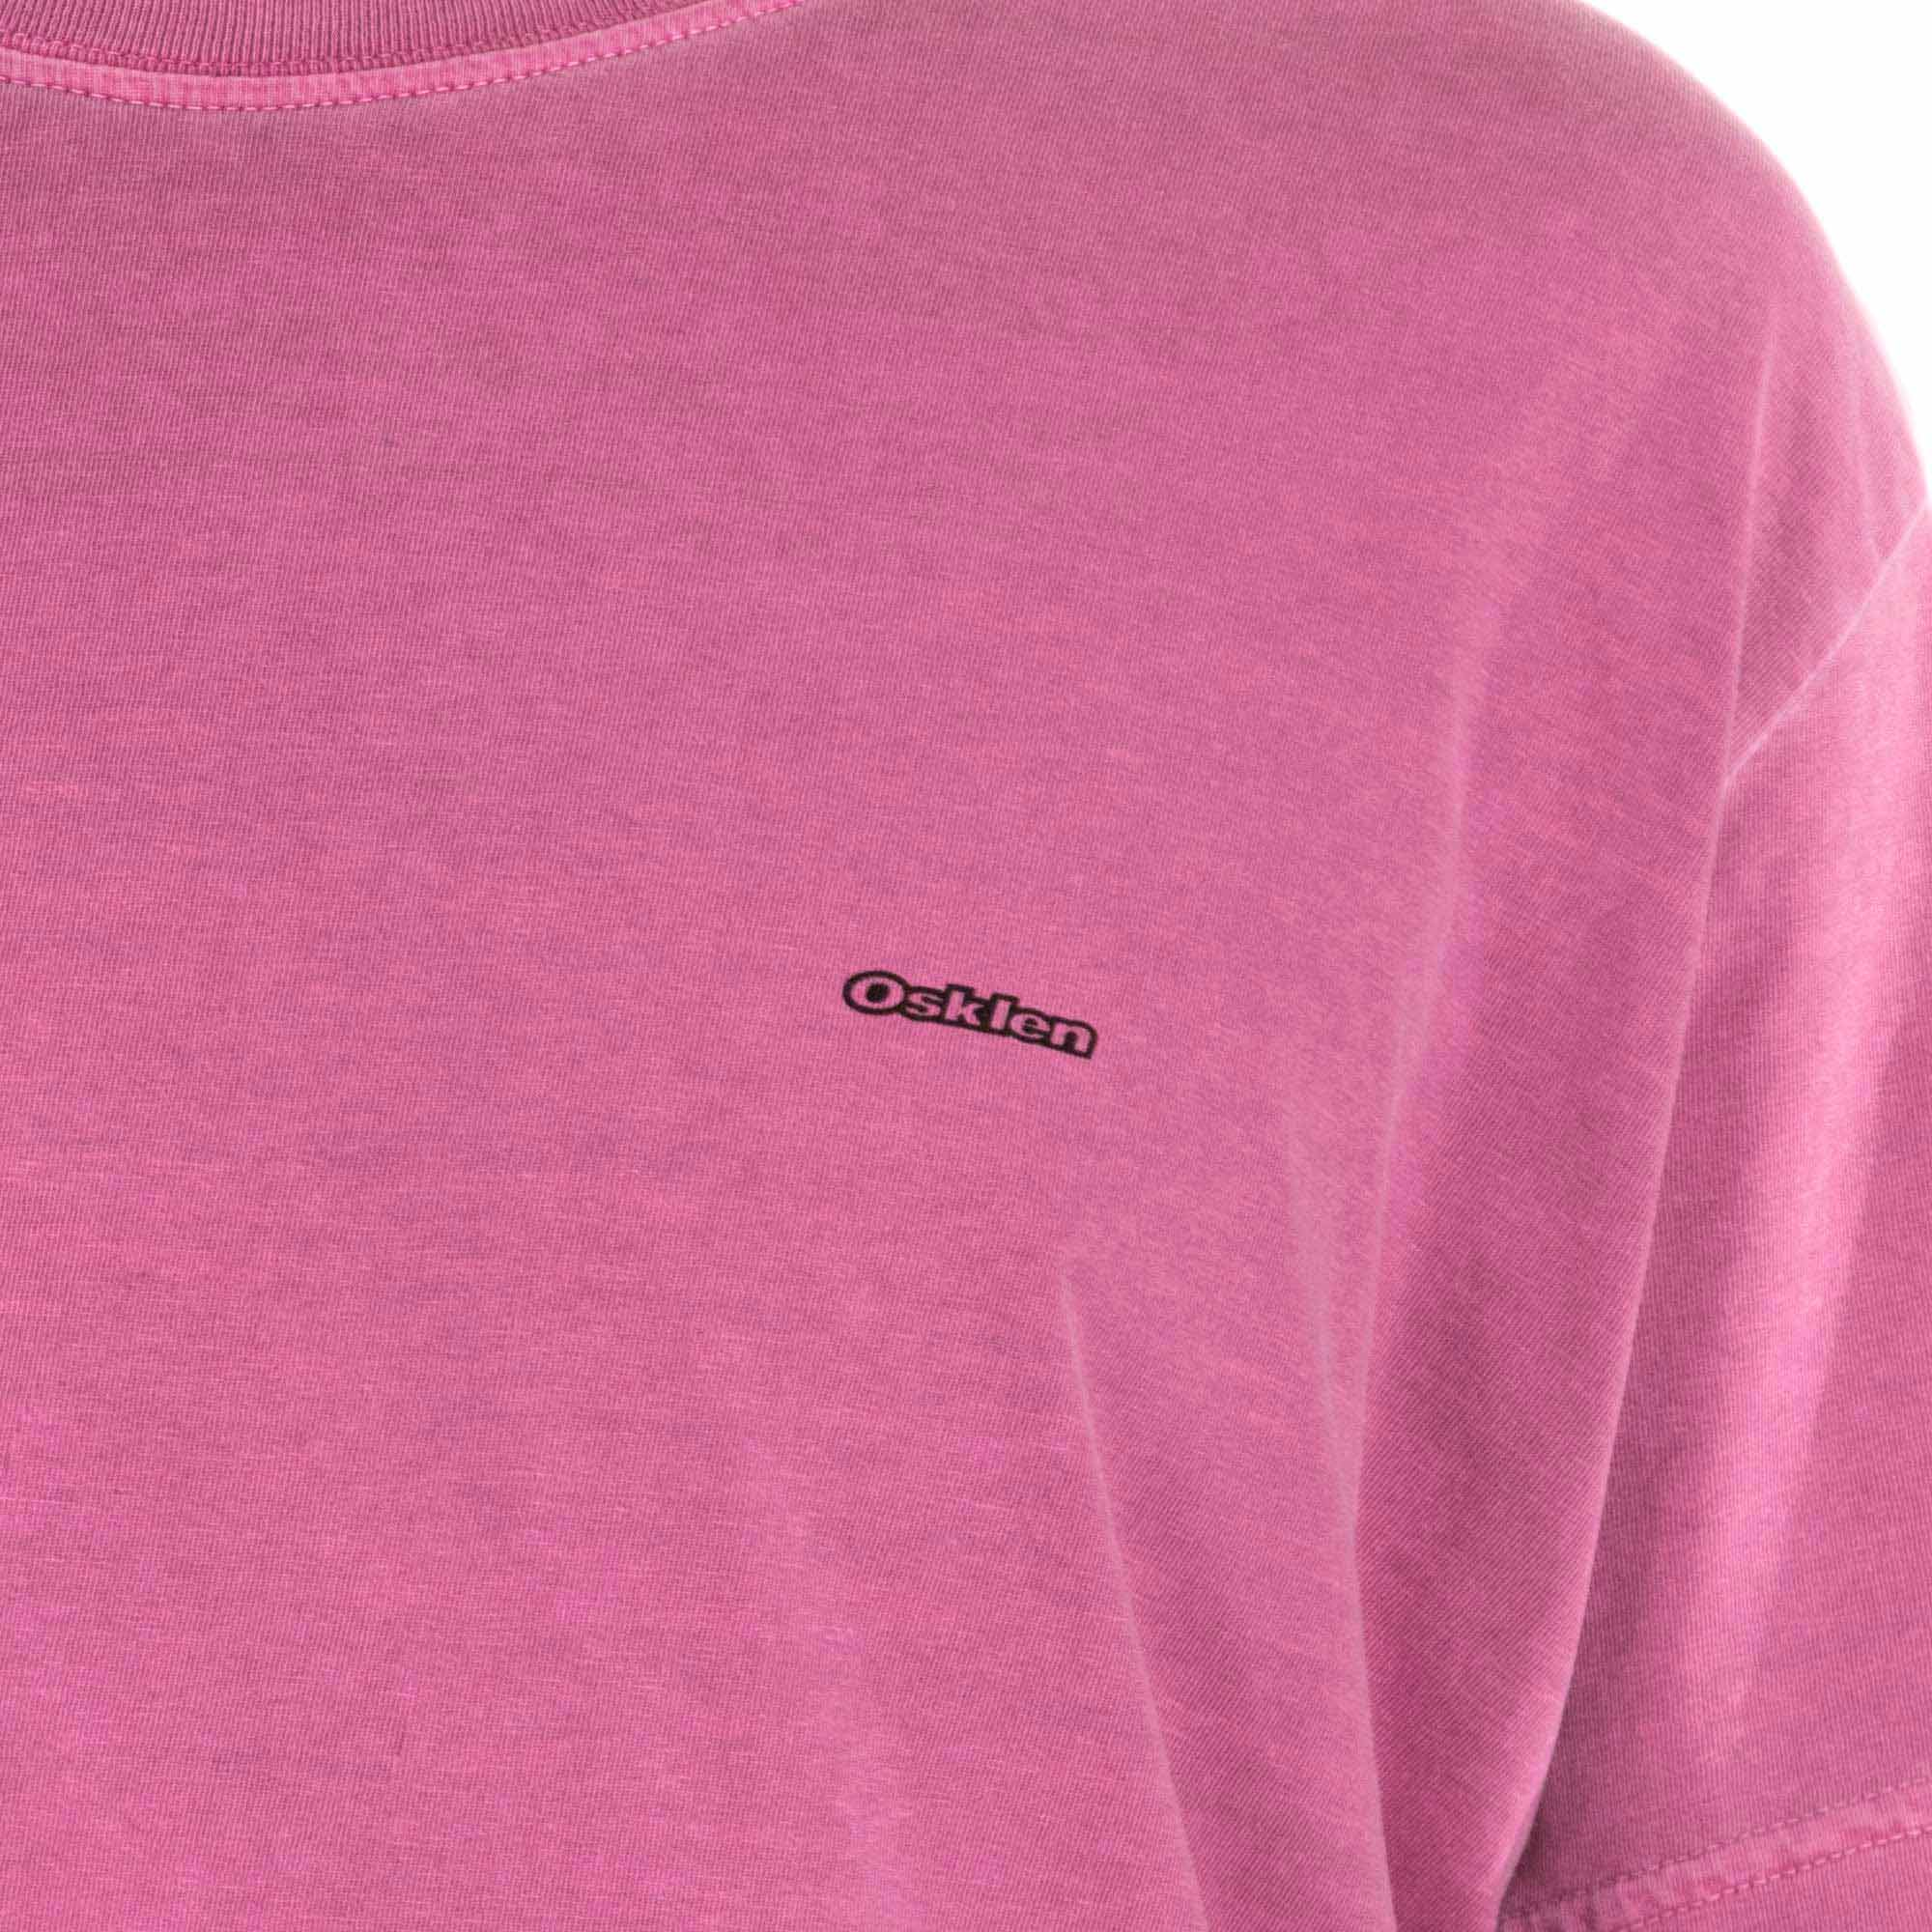 Osklen Camiseta Sonus Manga Curta Masculino Rosa